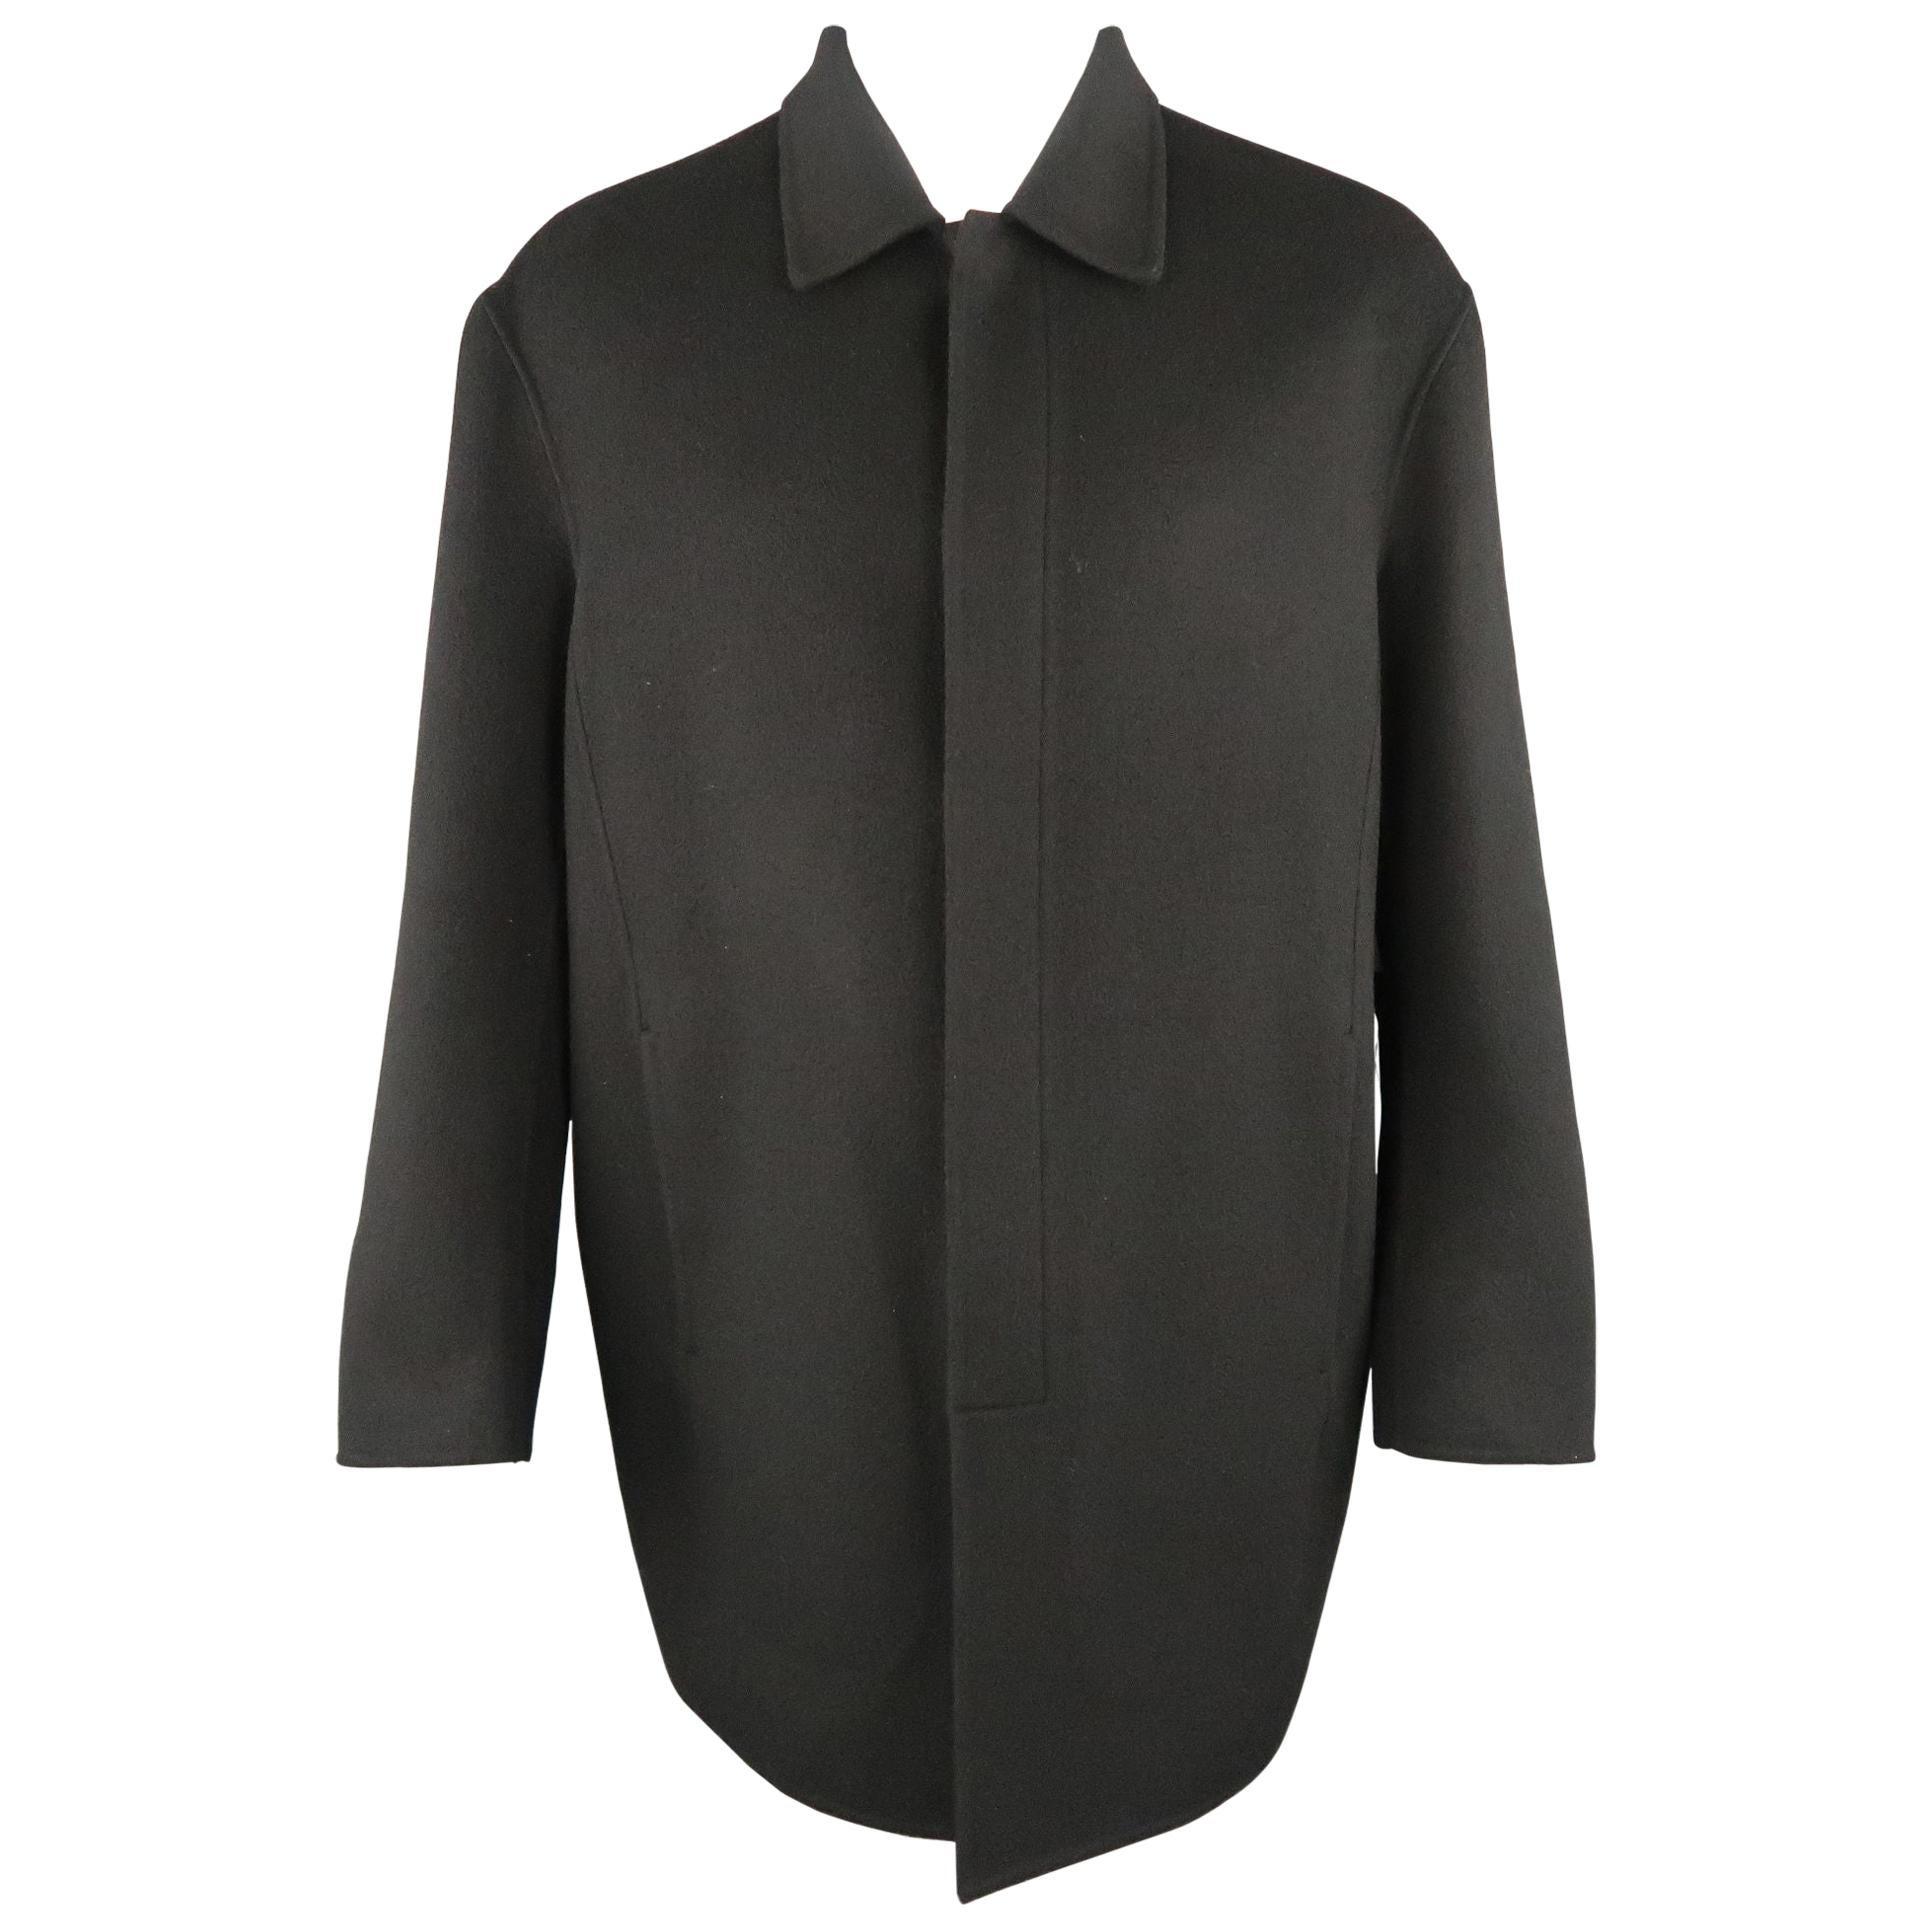 DONNA KARAN M Black Solid Wool / Nylon Hidden Placket Car Coat